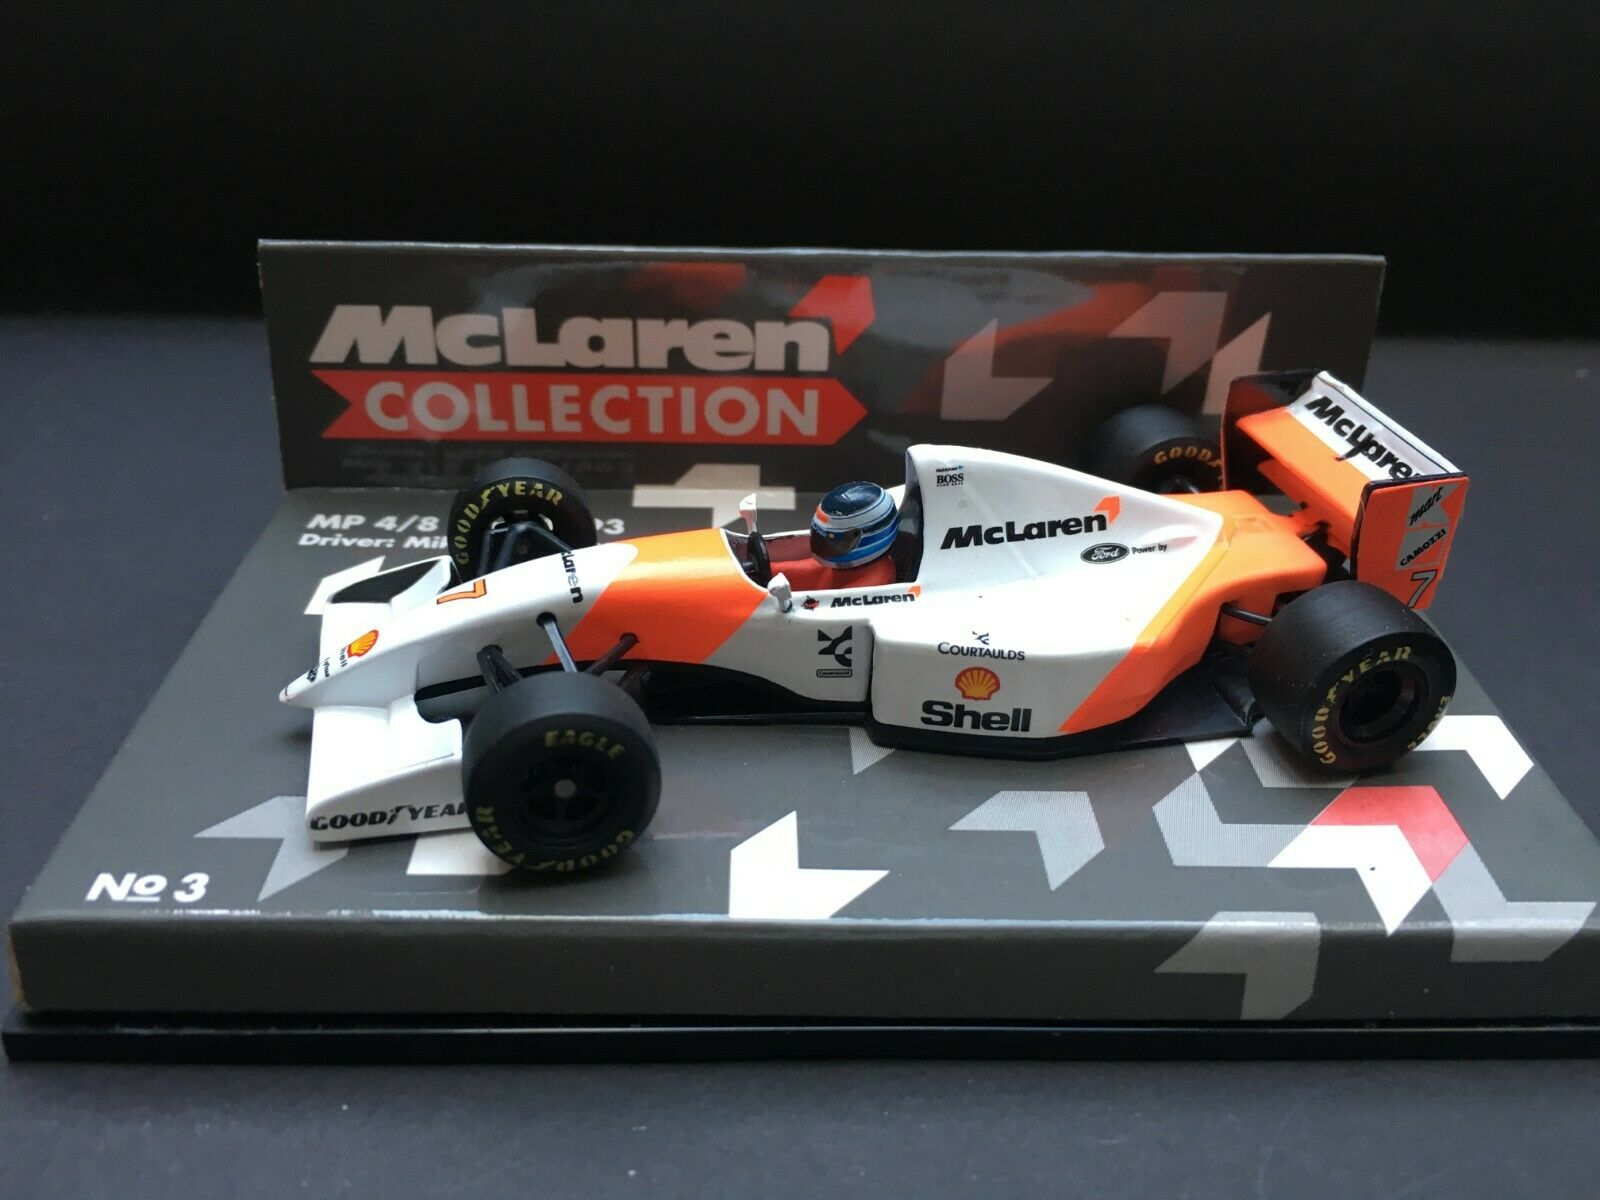 Minichamps - Mika Hakkinen - McLaren - MP4 8 - 1 43 -1993 - Team Edition